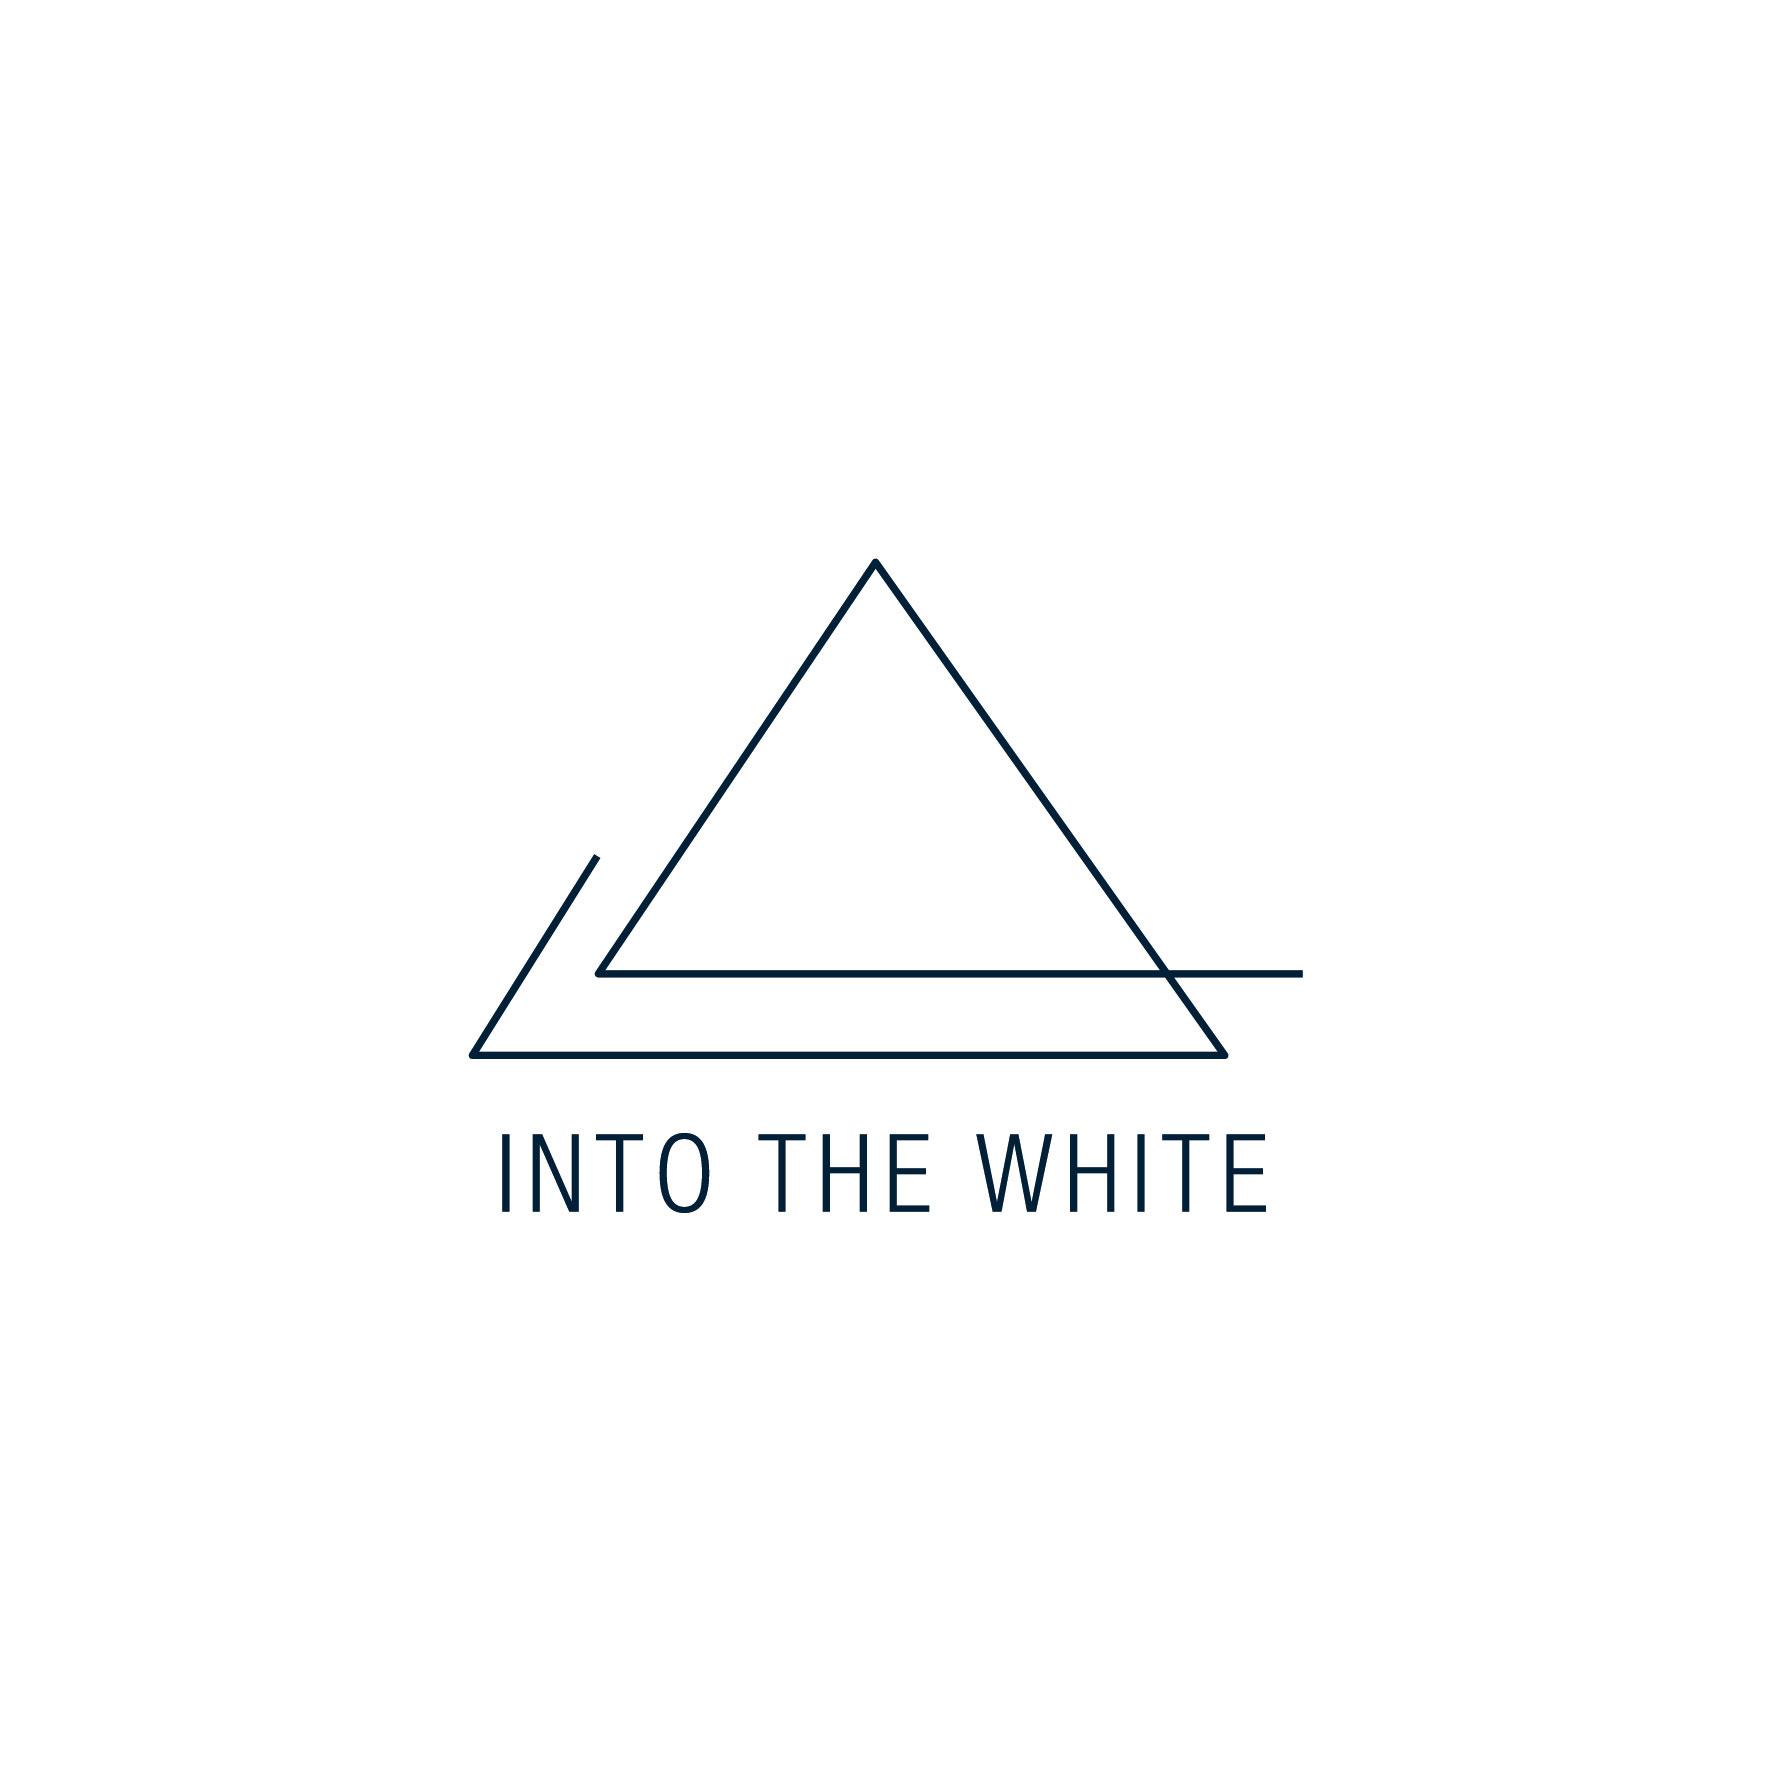 kretz+partners_intothewhite_00.jpg